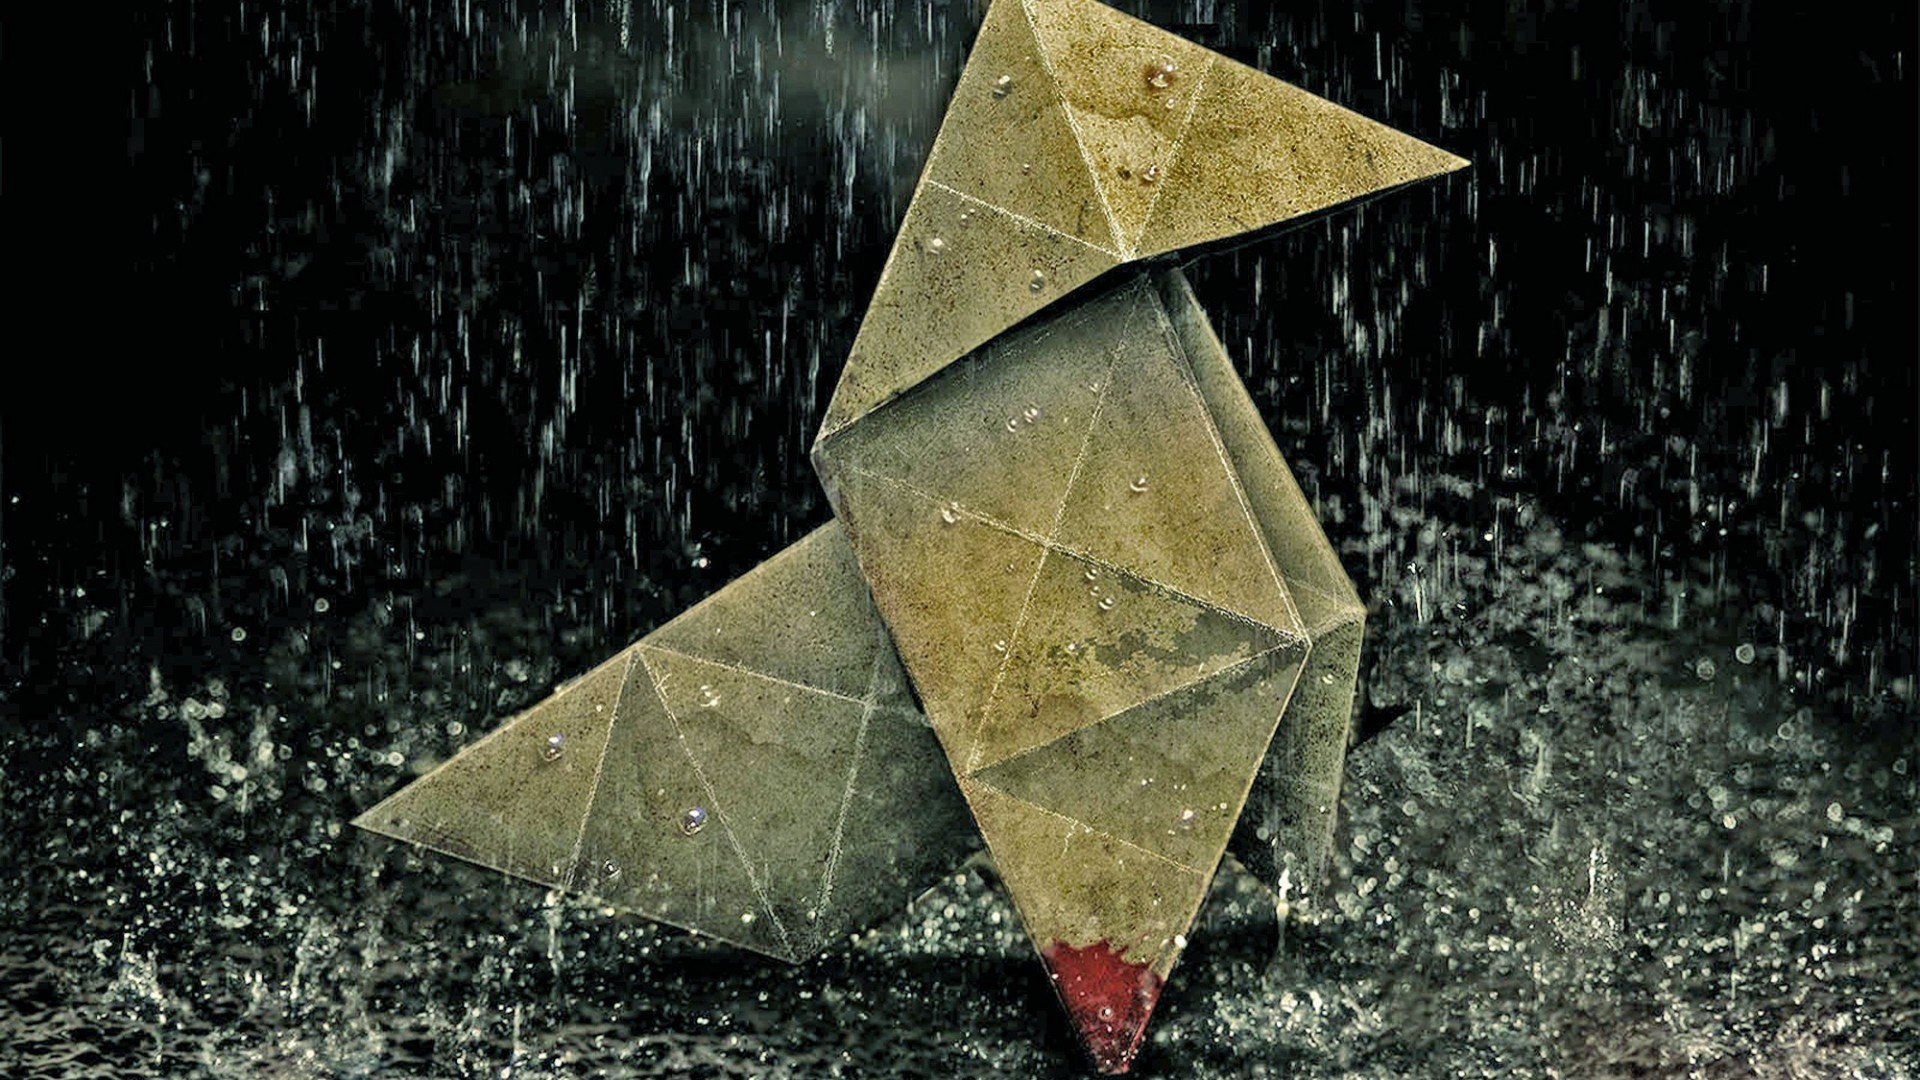 Heavy Rain HD wallpapers, Desktop wallpaper - most viewed